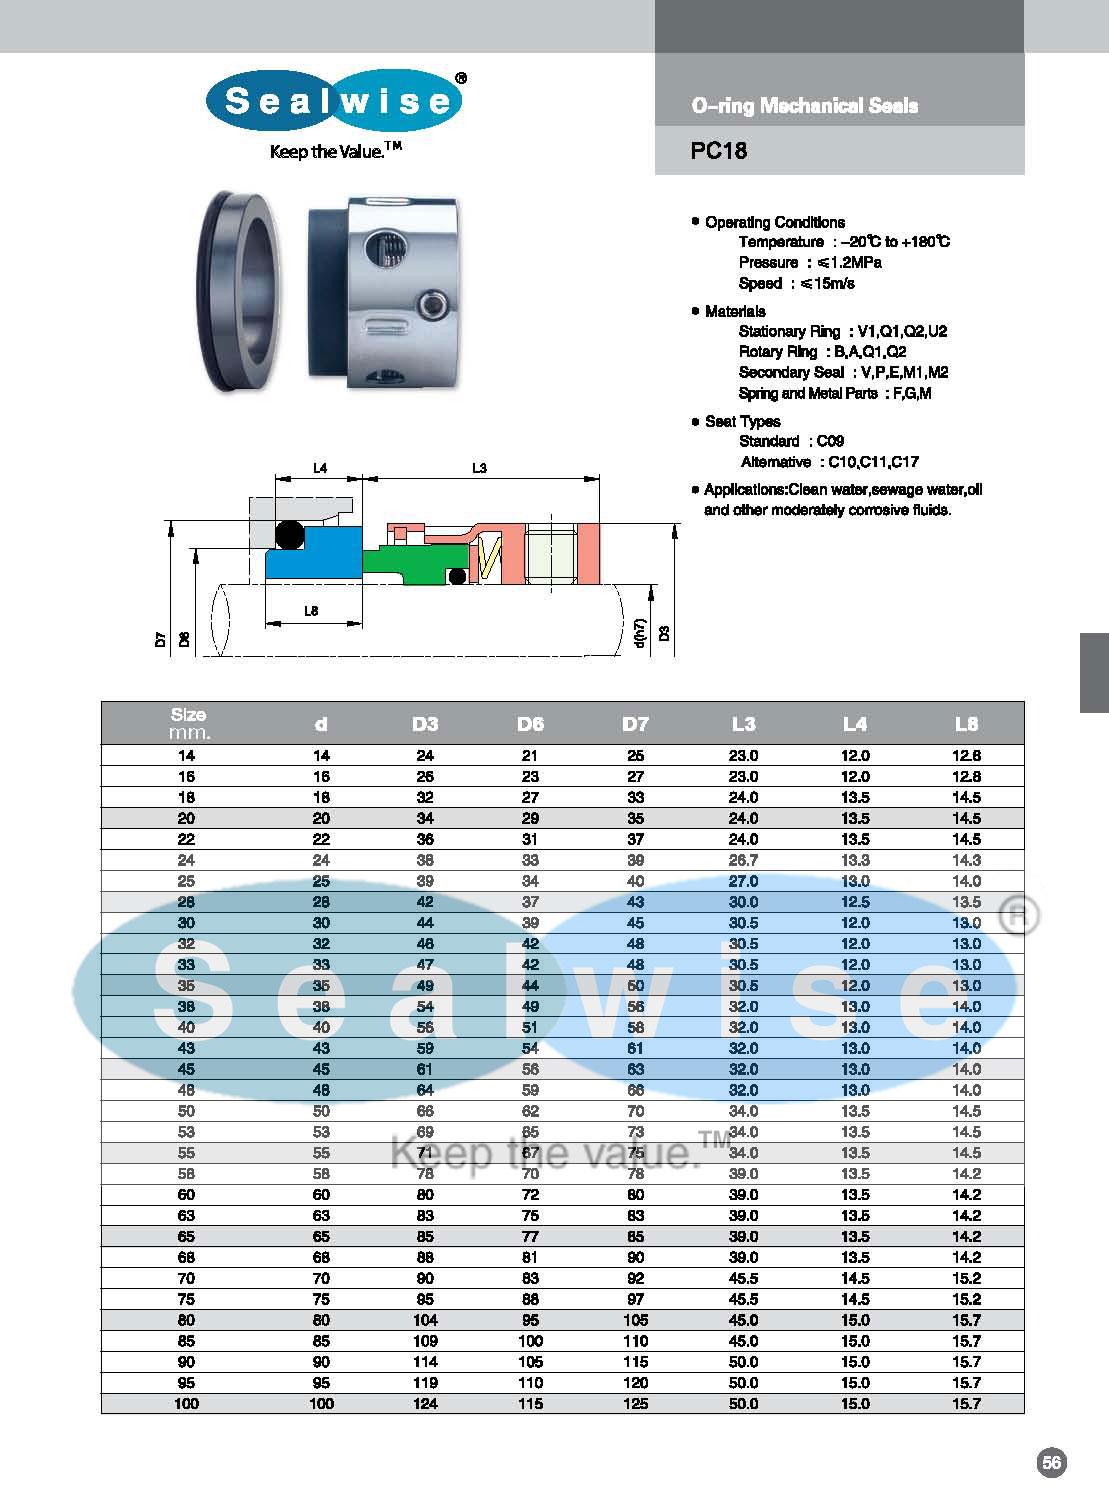 SW-PC18-catalog